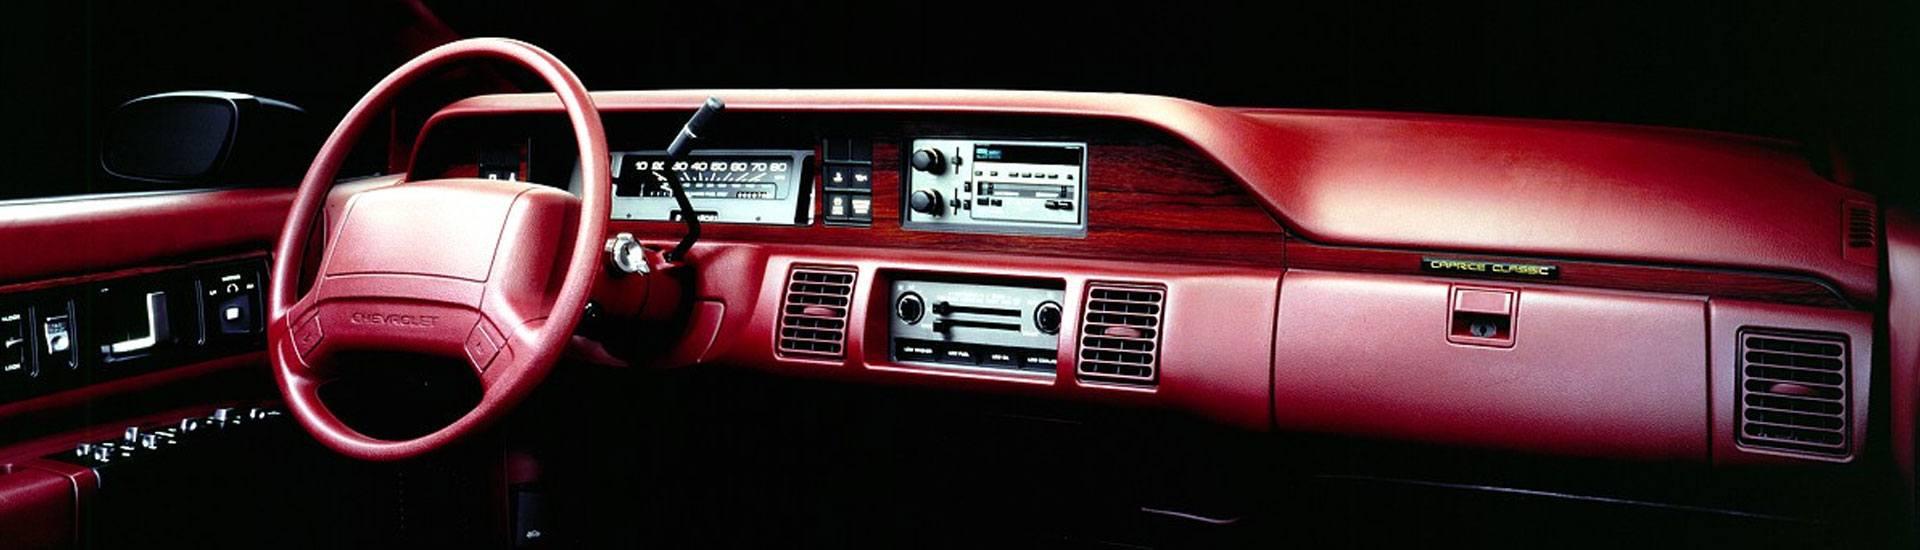 1991 Chevy Truck Dashes